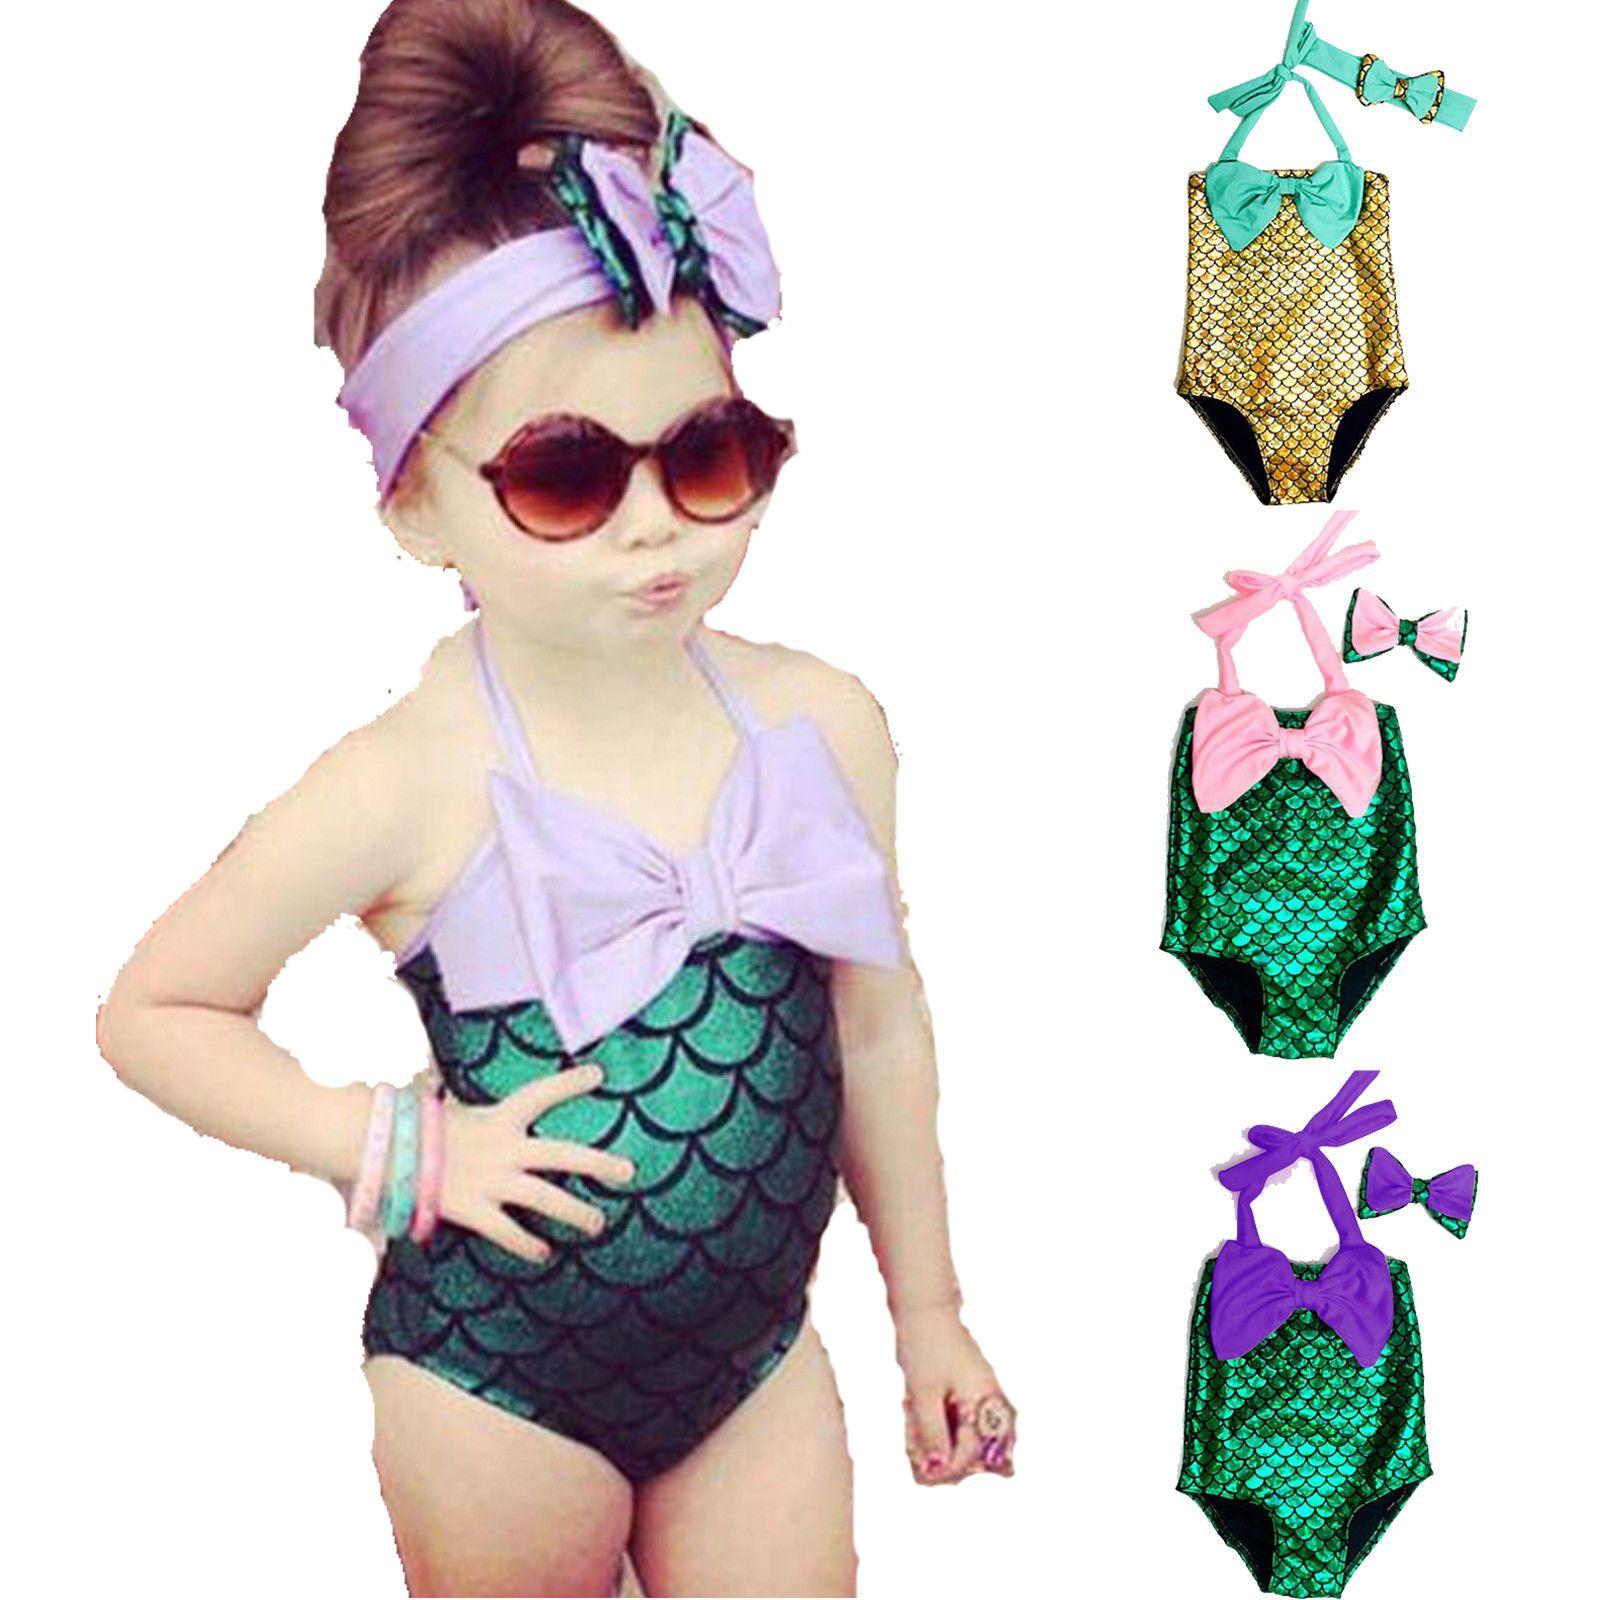 9061b01773f 2019 Baby Girls Mermaid Bikini Suit Swimming Princess Costume Swimsuit Kids  Toddler Girls Swimming Suits 3styles FFA071 From Kids dress